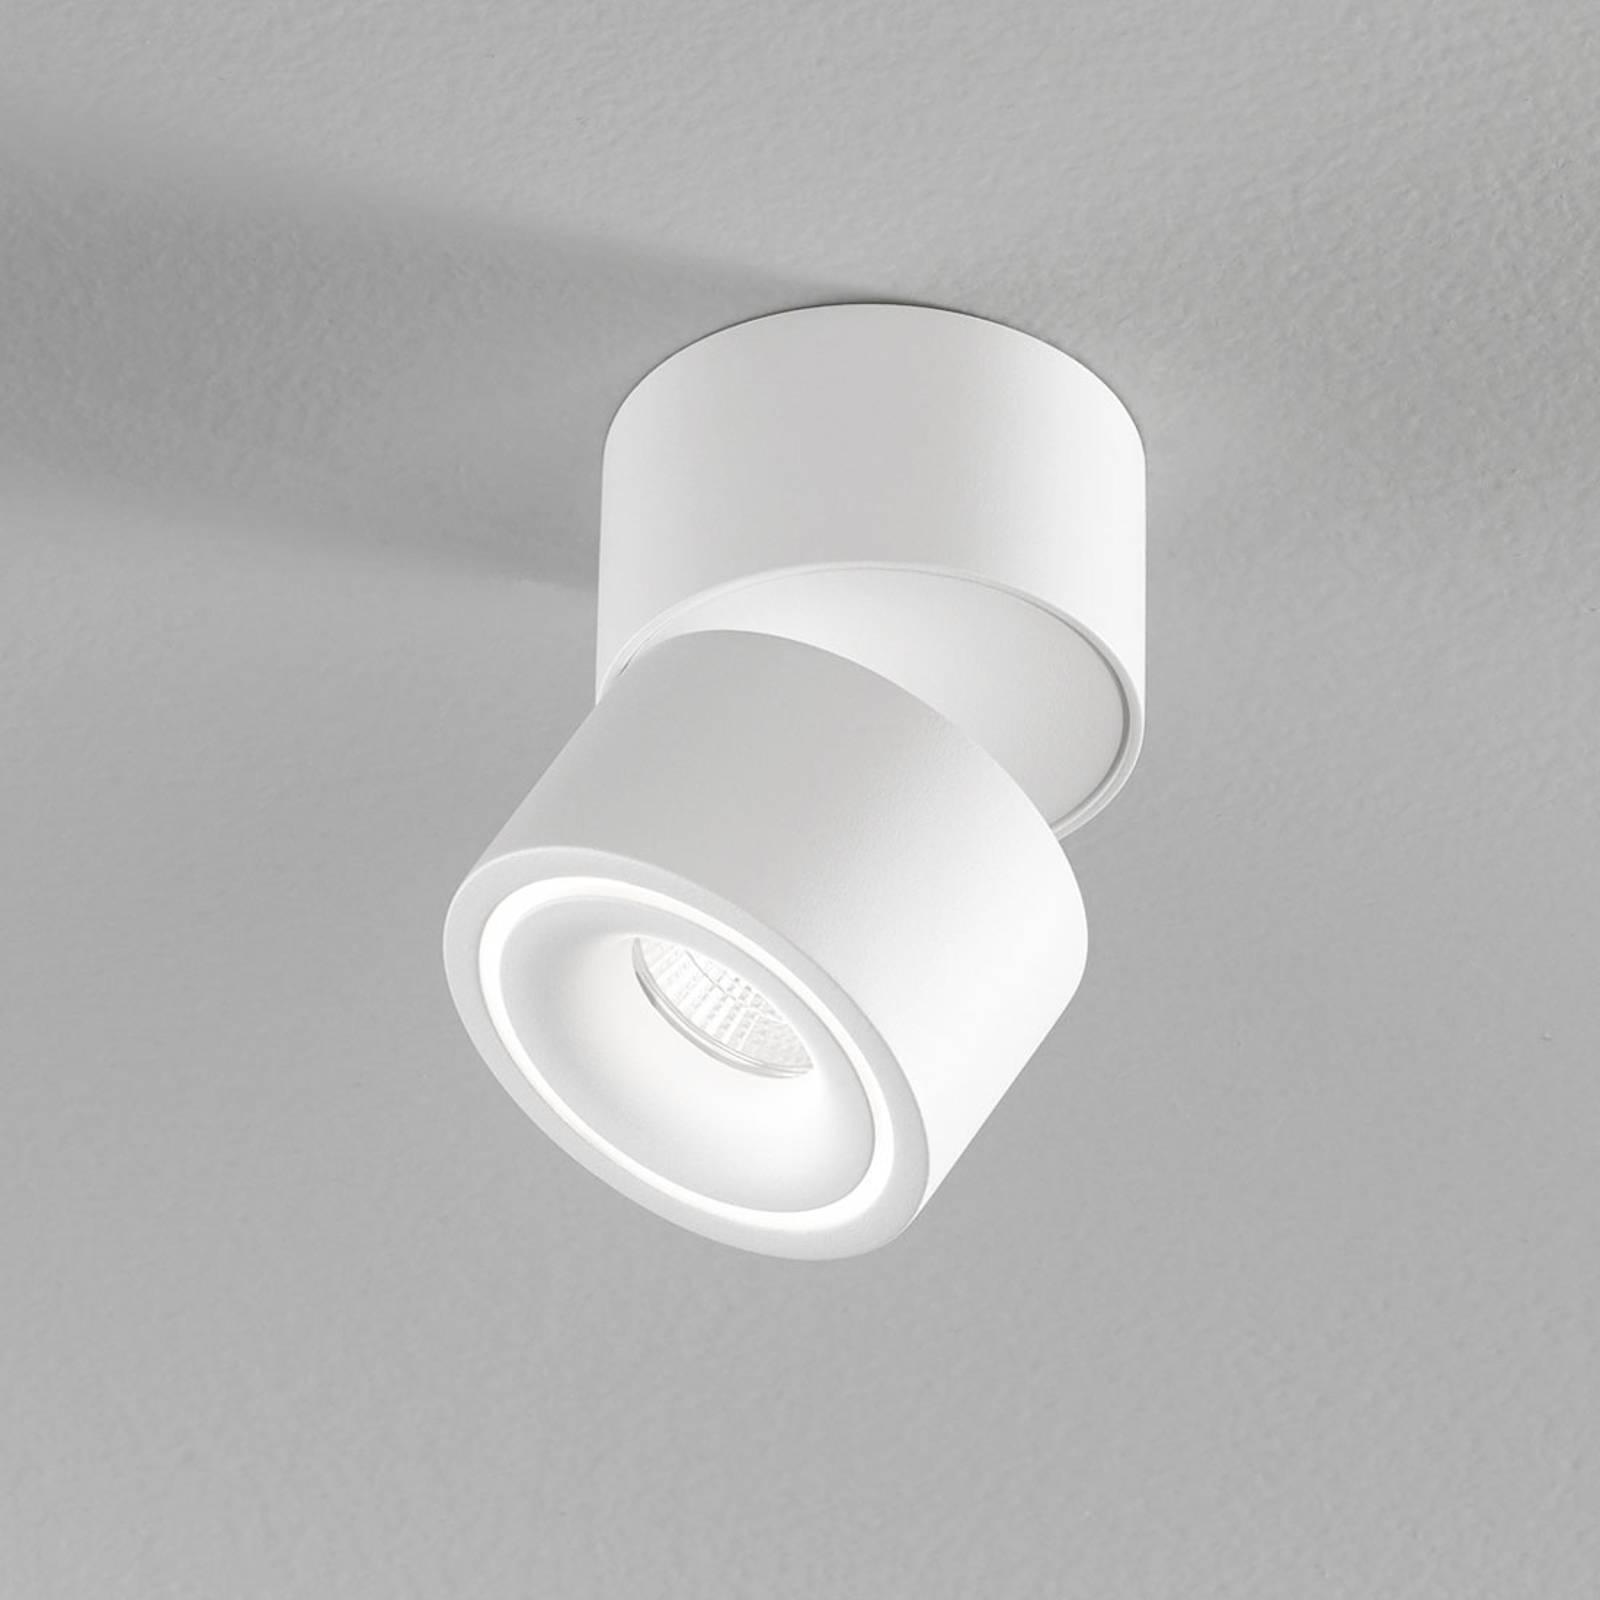 Egger Clippo S LED-kattokohdevalo, valkoinen